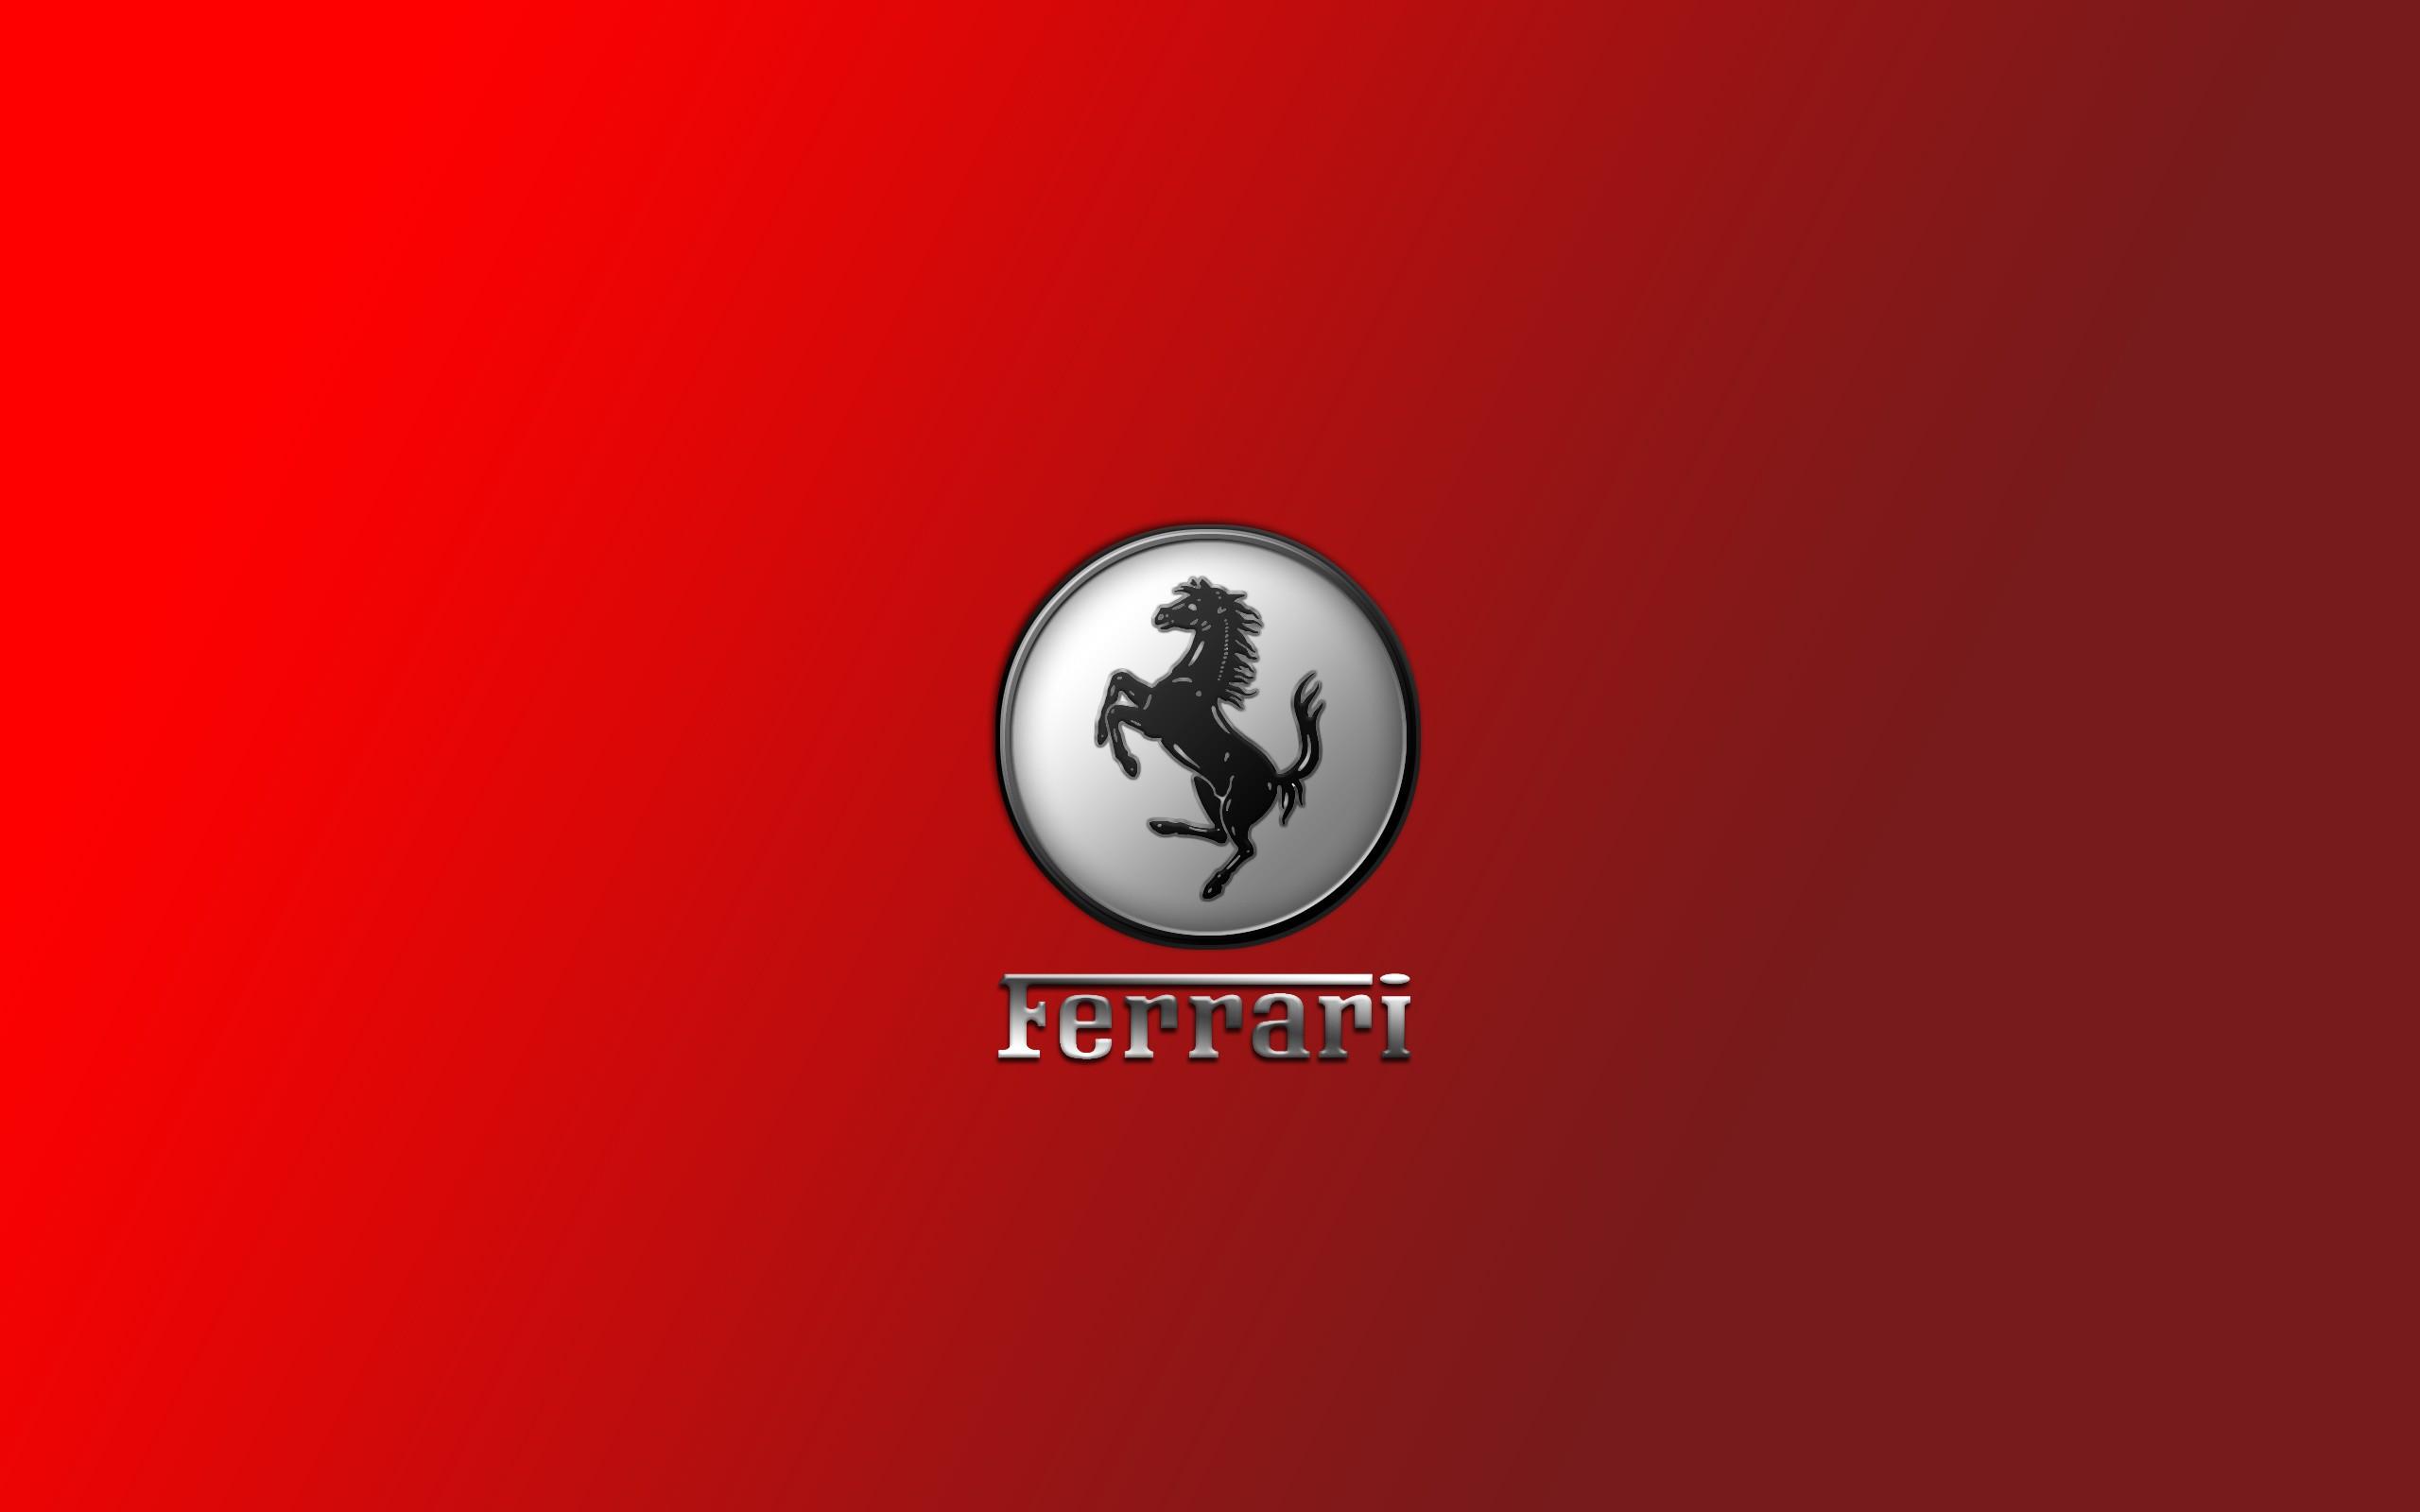 Ferrari Logo hd 2560x1600 - imagenes - wallpapers gratis - Diseño de ...: www.fondox.net/wallpaper/2560x1600/72-ferrari-logo.html